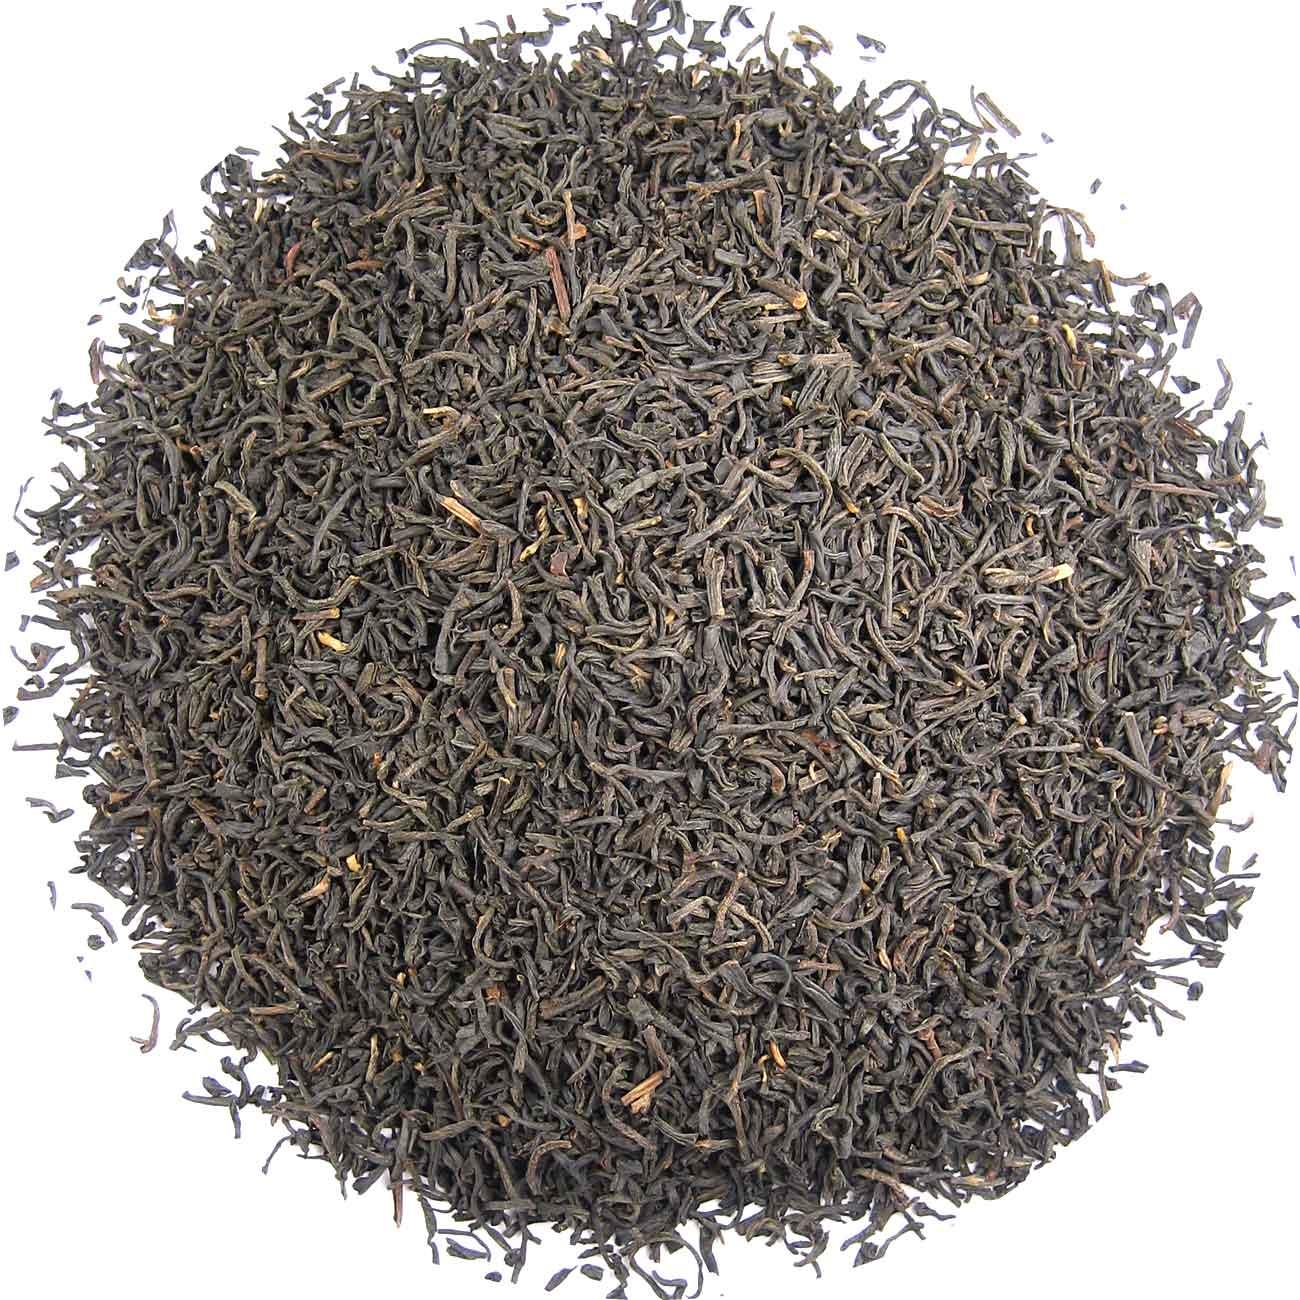 Organic Yunnan Black Tea - 4uTea | 4uTea.com